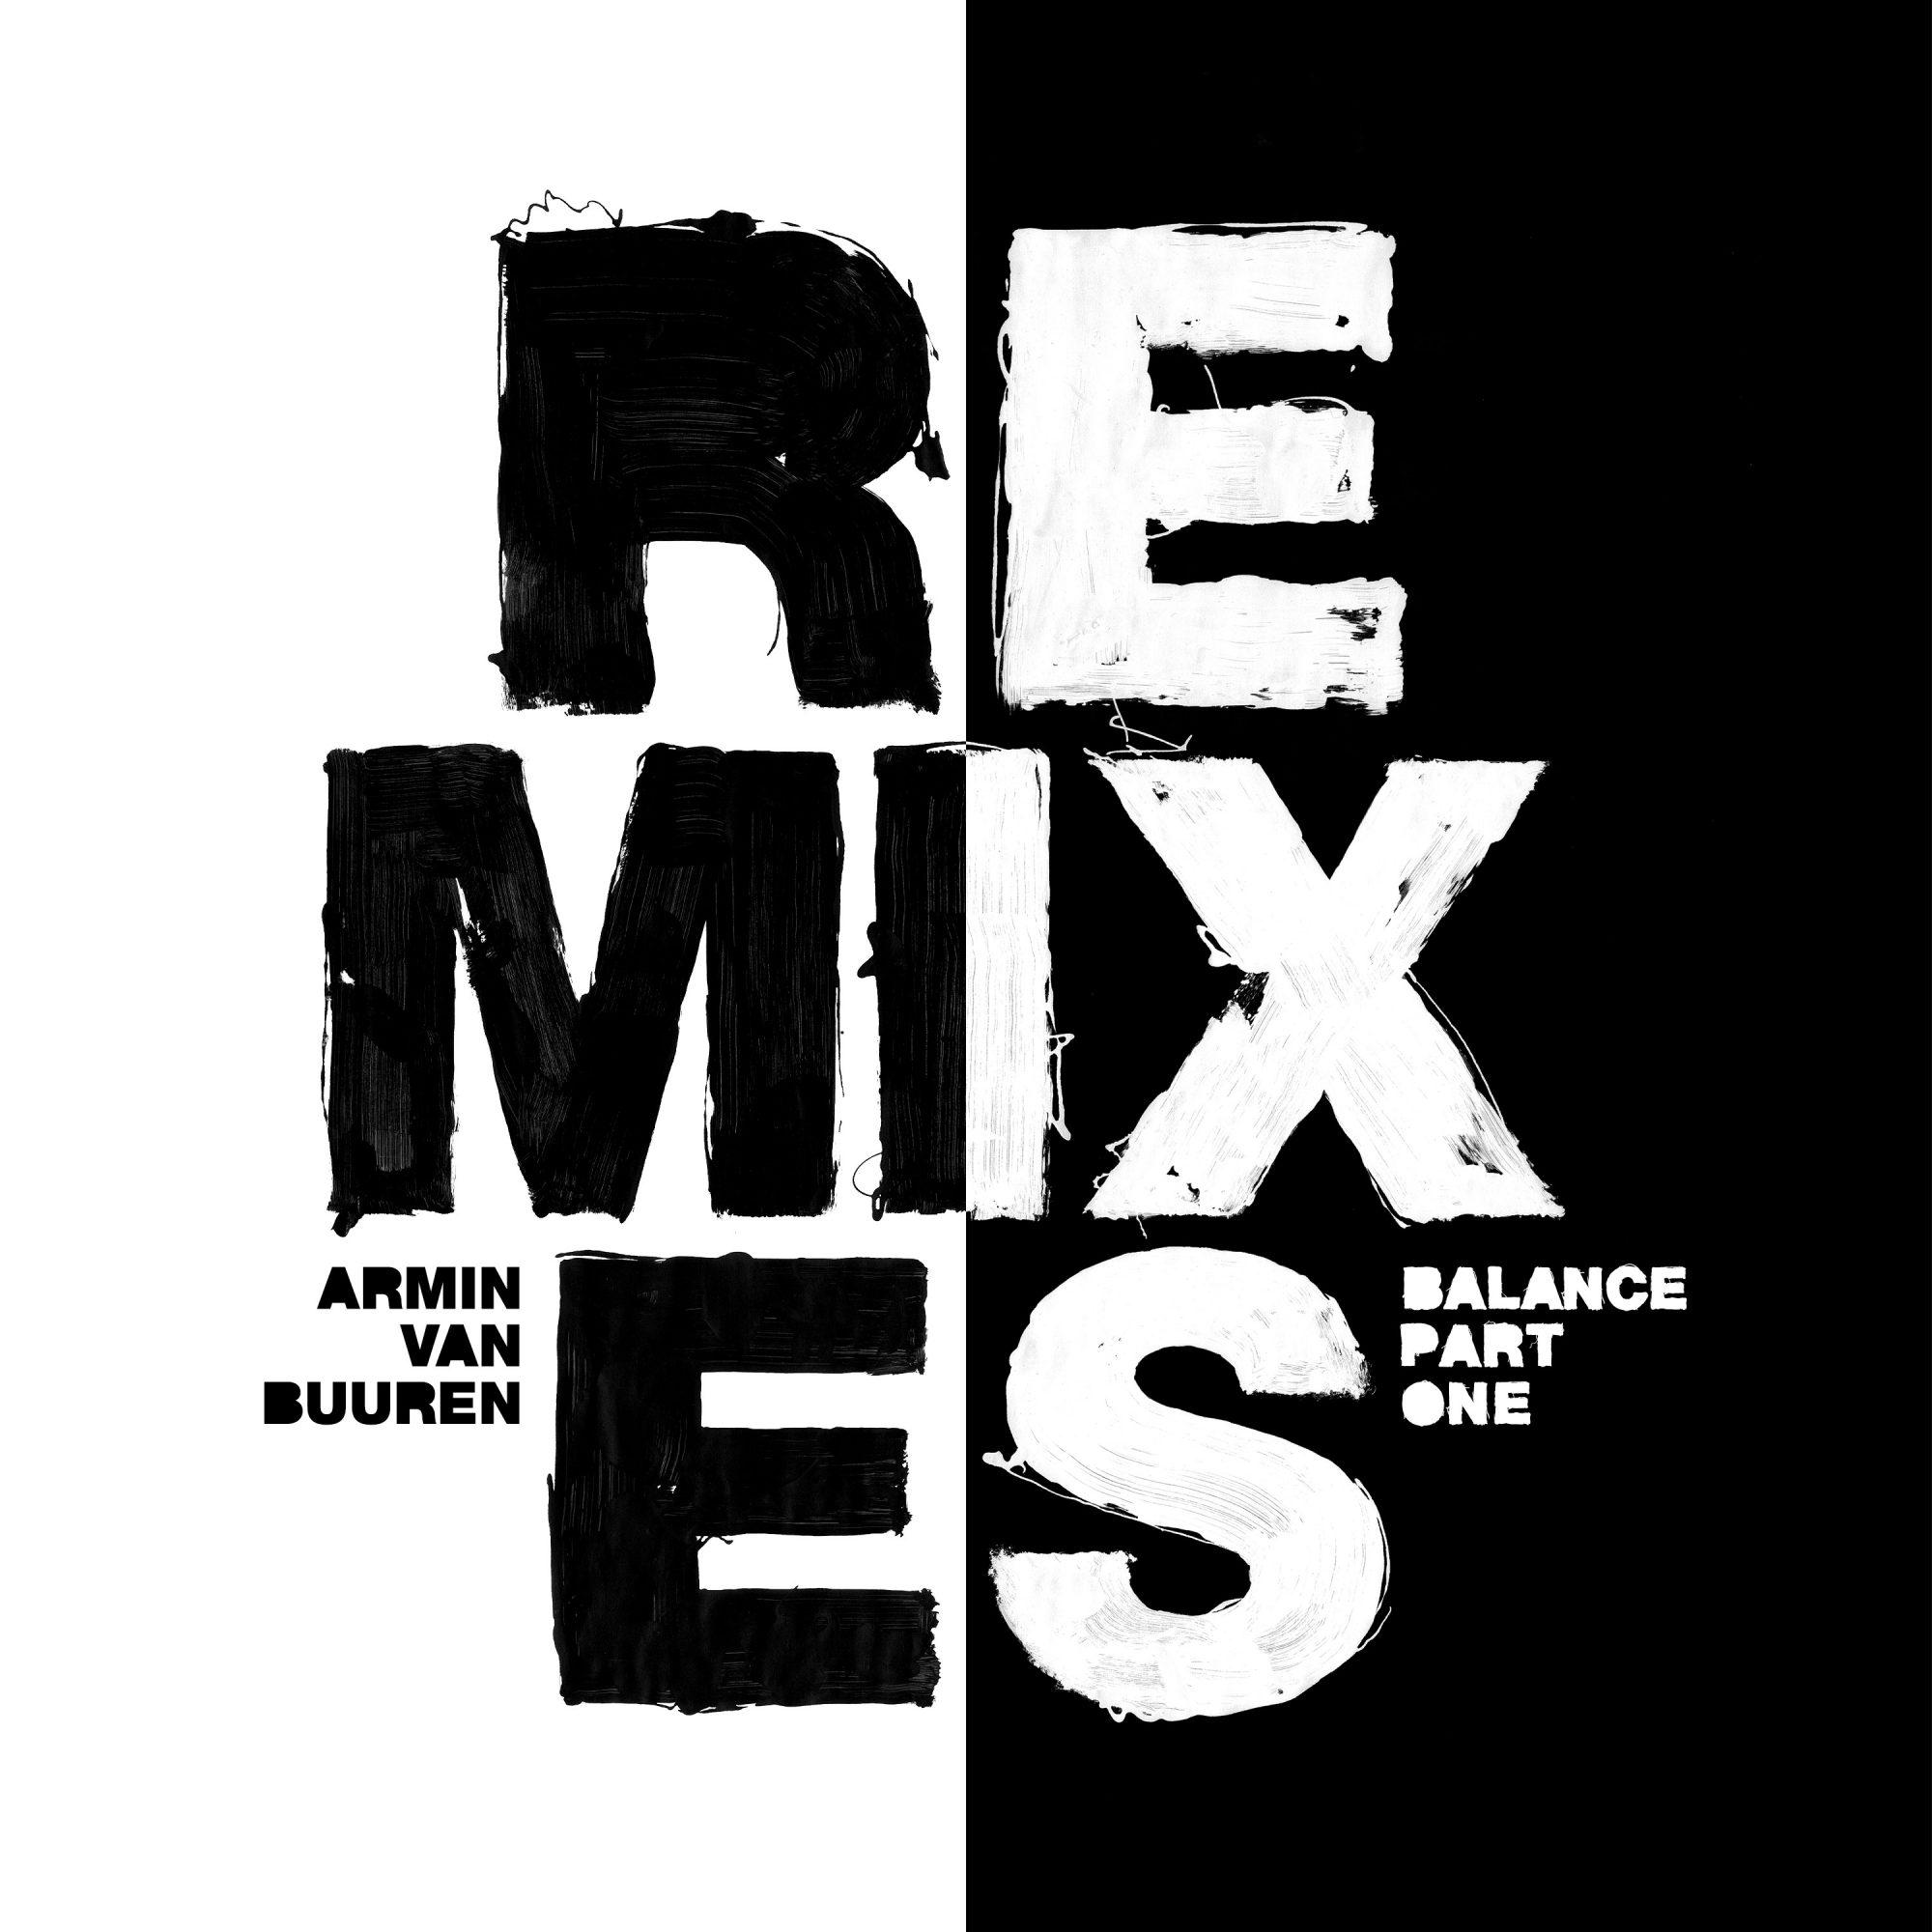 Armin van Buuren Balance Remixes Pt. 1